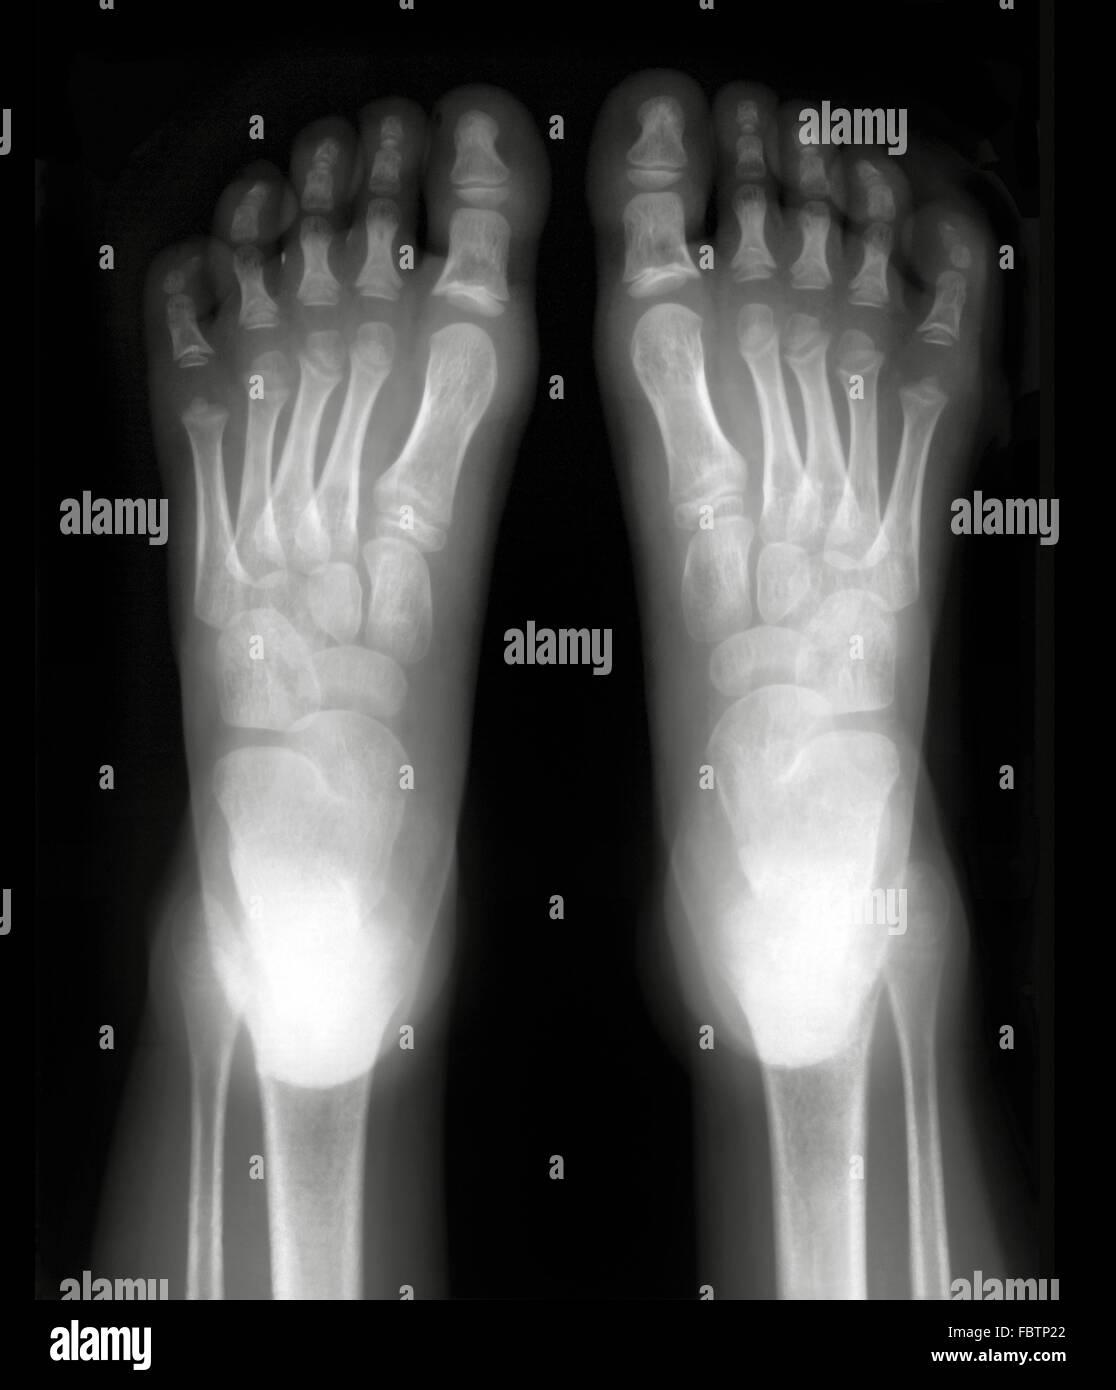 Foot Xray Stock Photos & Foot Xray Stock Images - Alamy